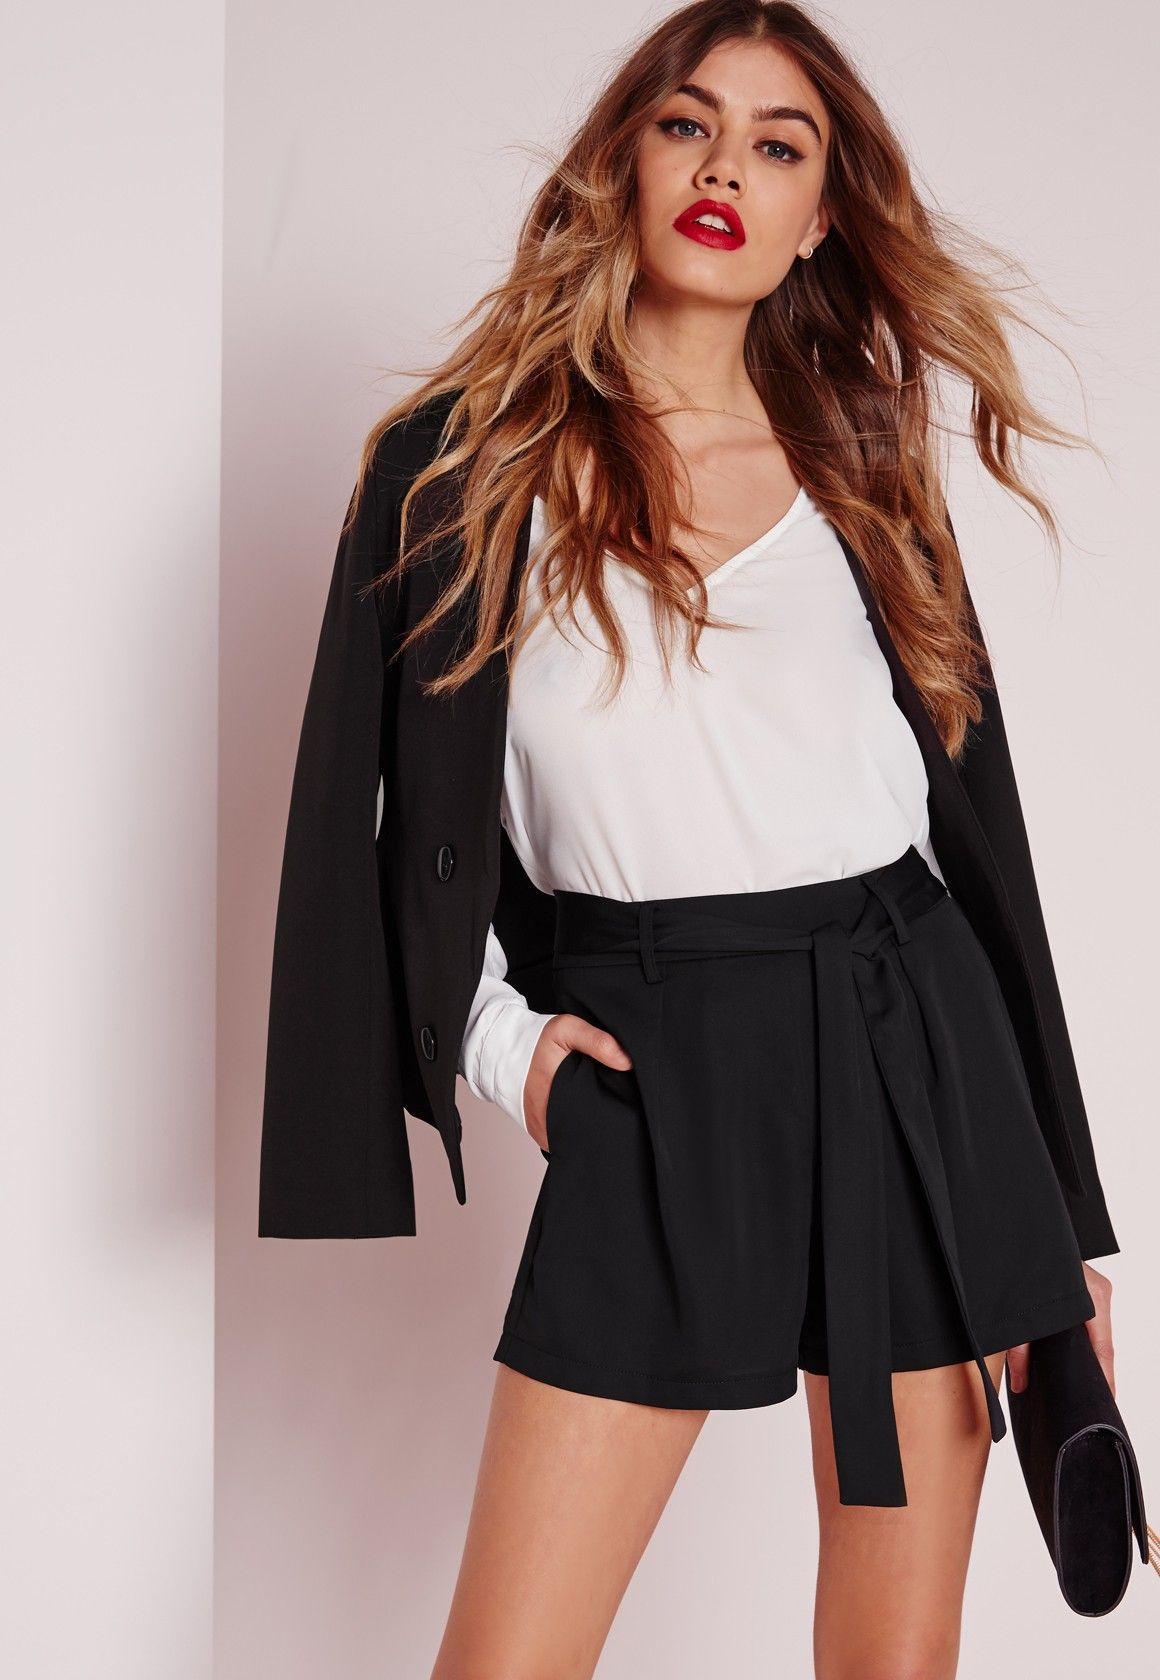 Black Tie Shorts